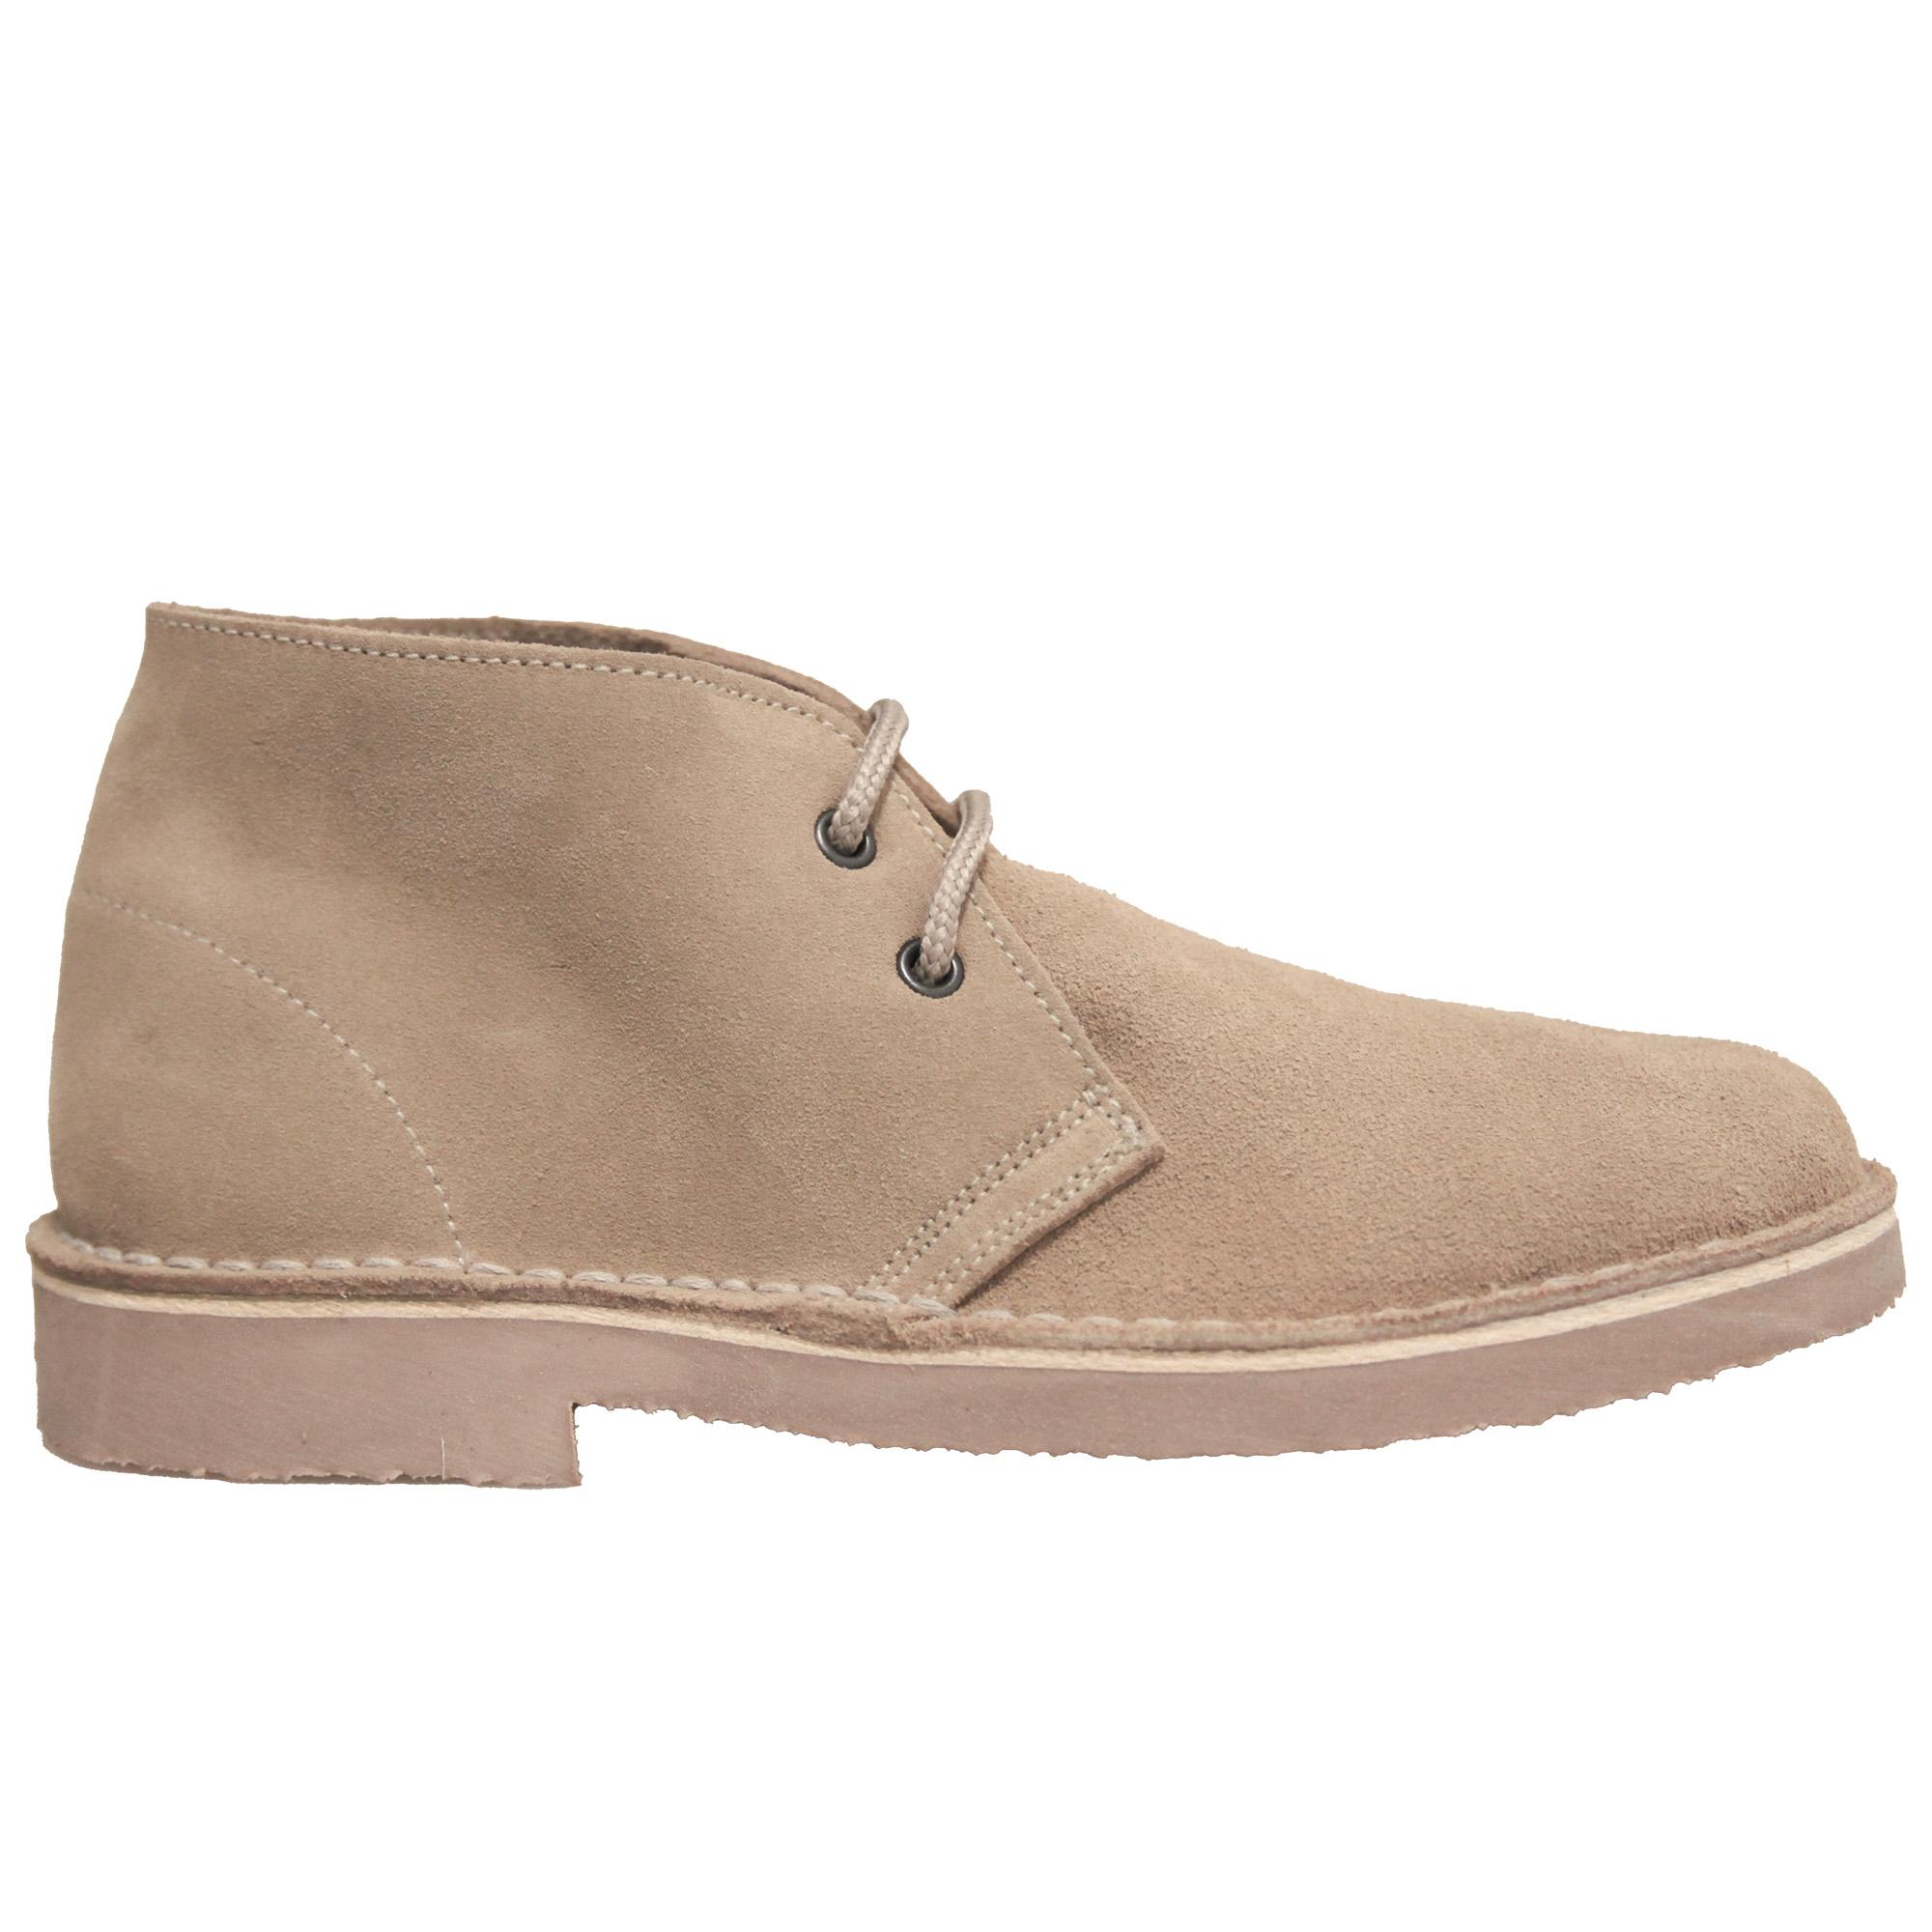 Roamers Mens Real Suede Unlined Desert Boots (4 UK) (Navy)